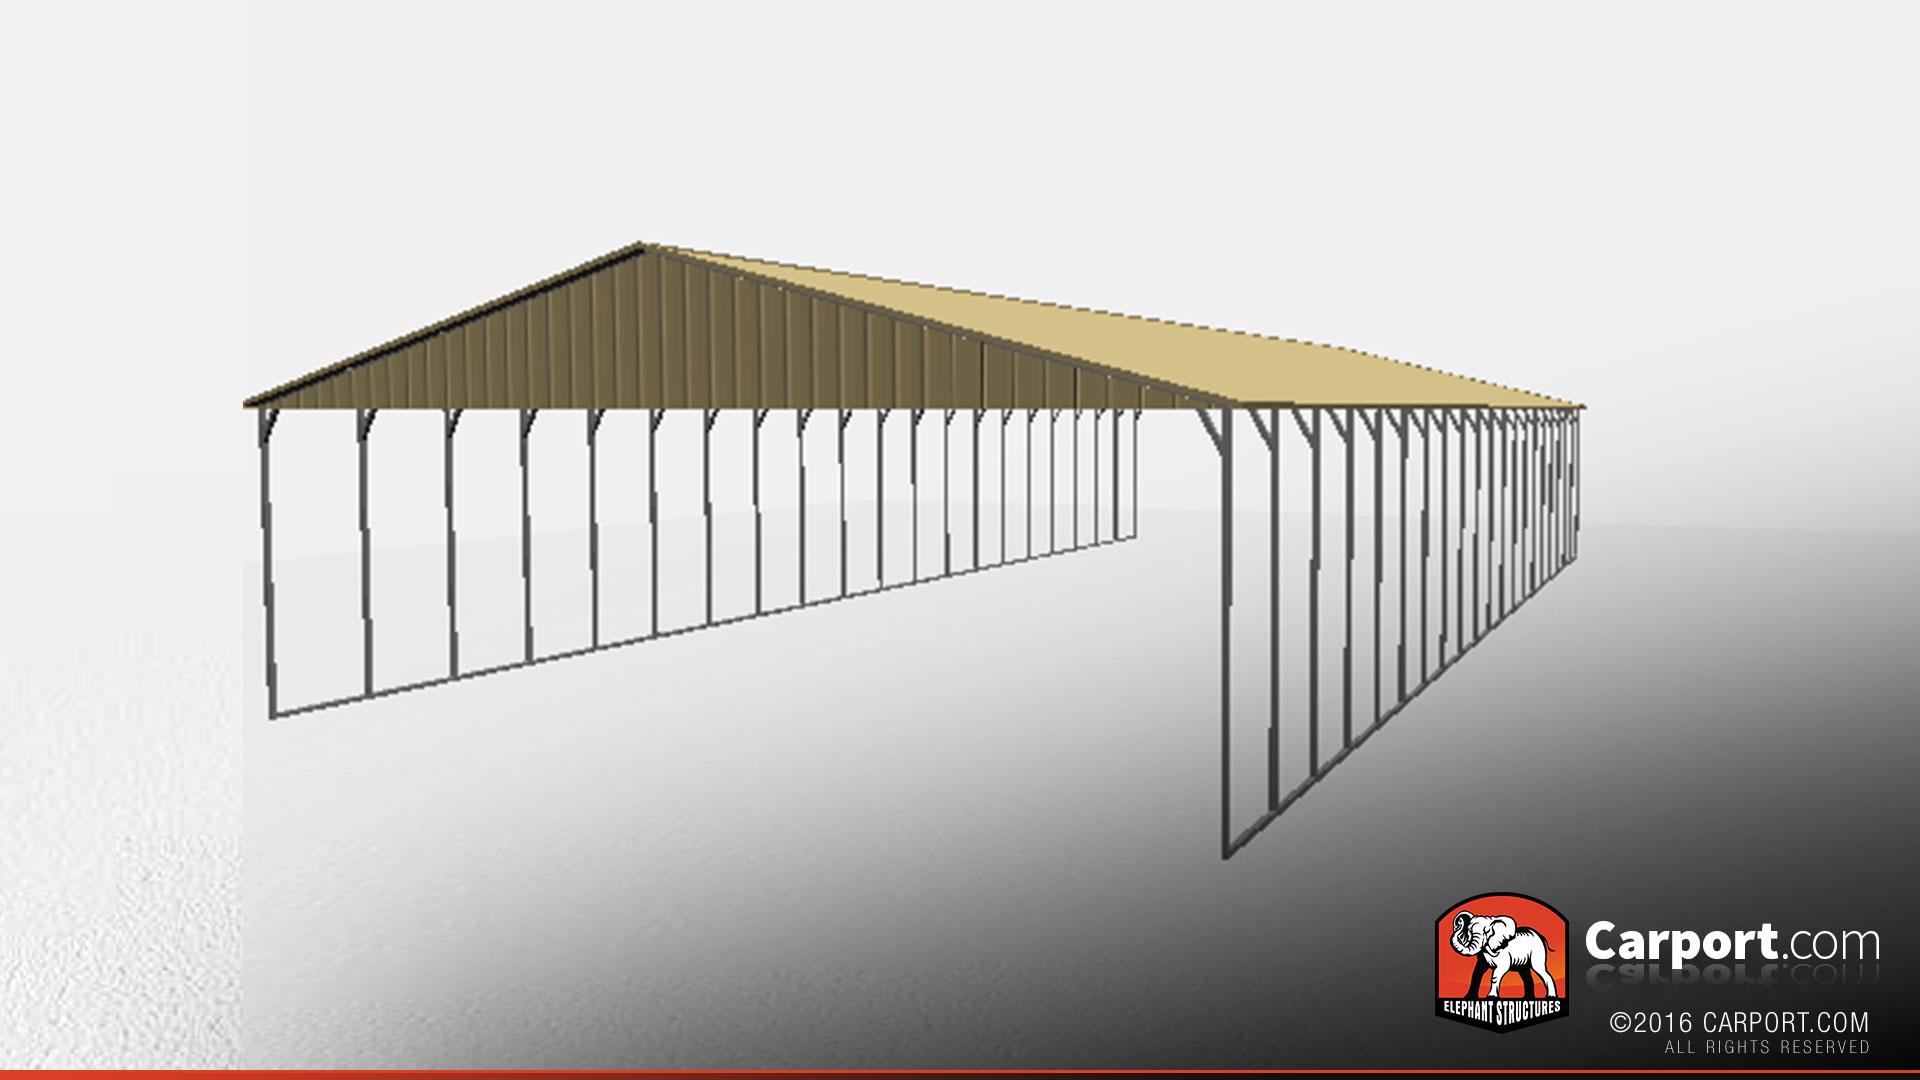 40 39 x 80 39 x 12 39 vertical roof commercial metal carport for Wohnzimmertisch 80 x 40